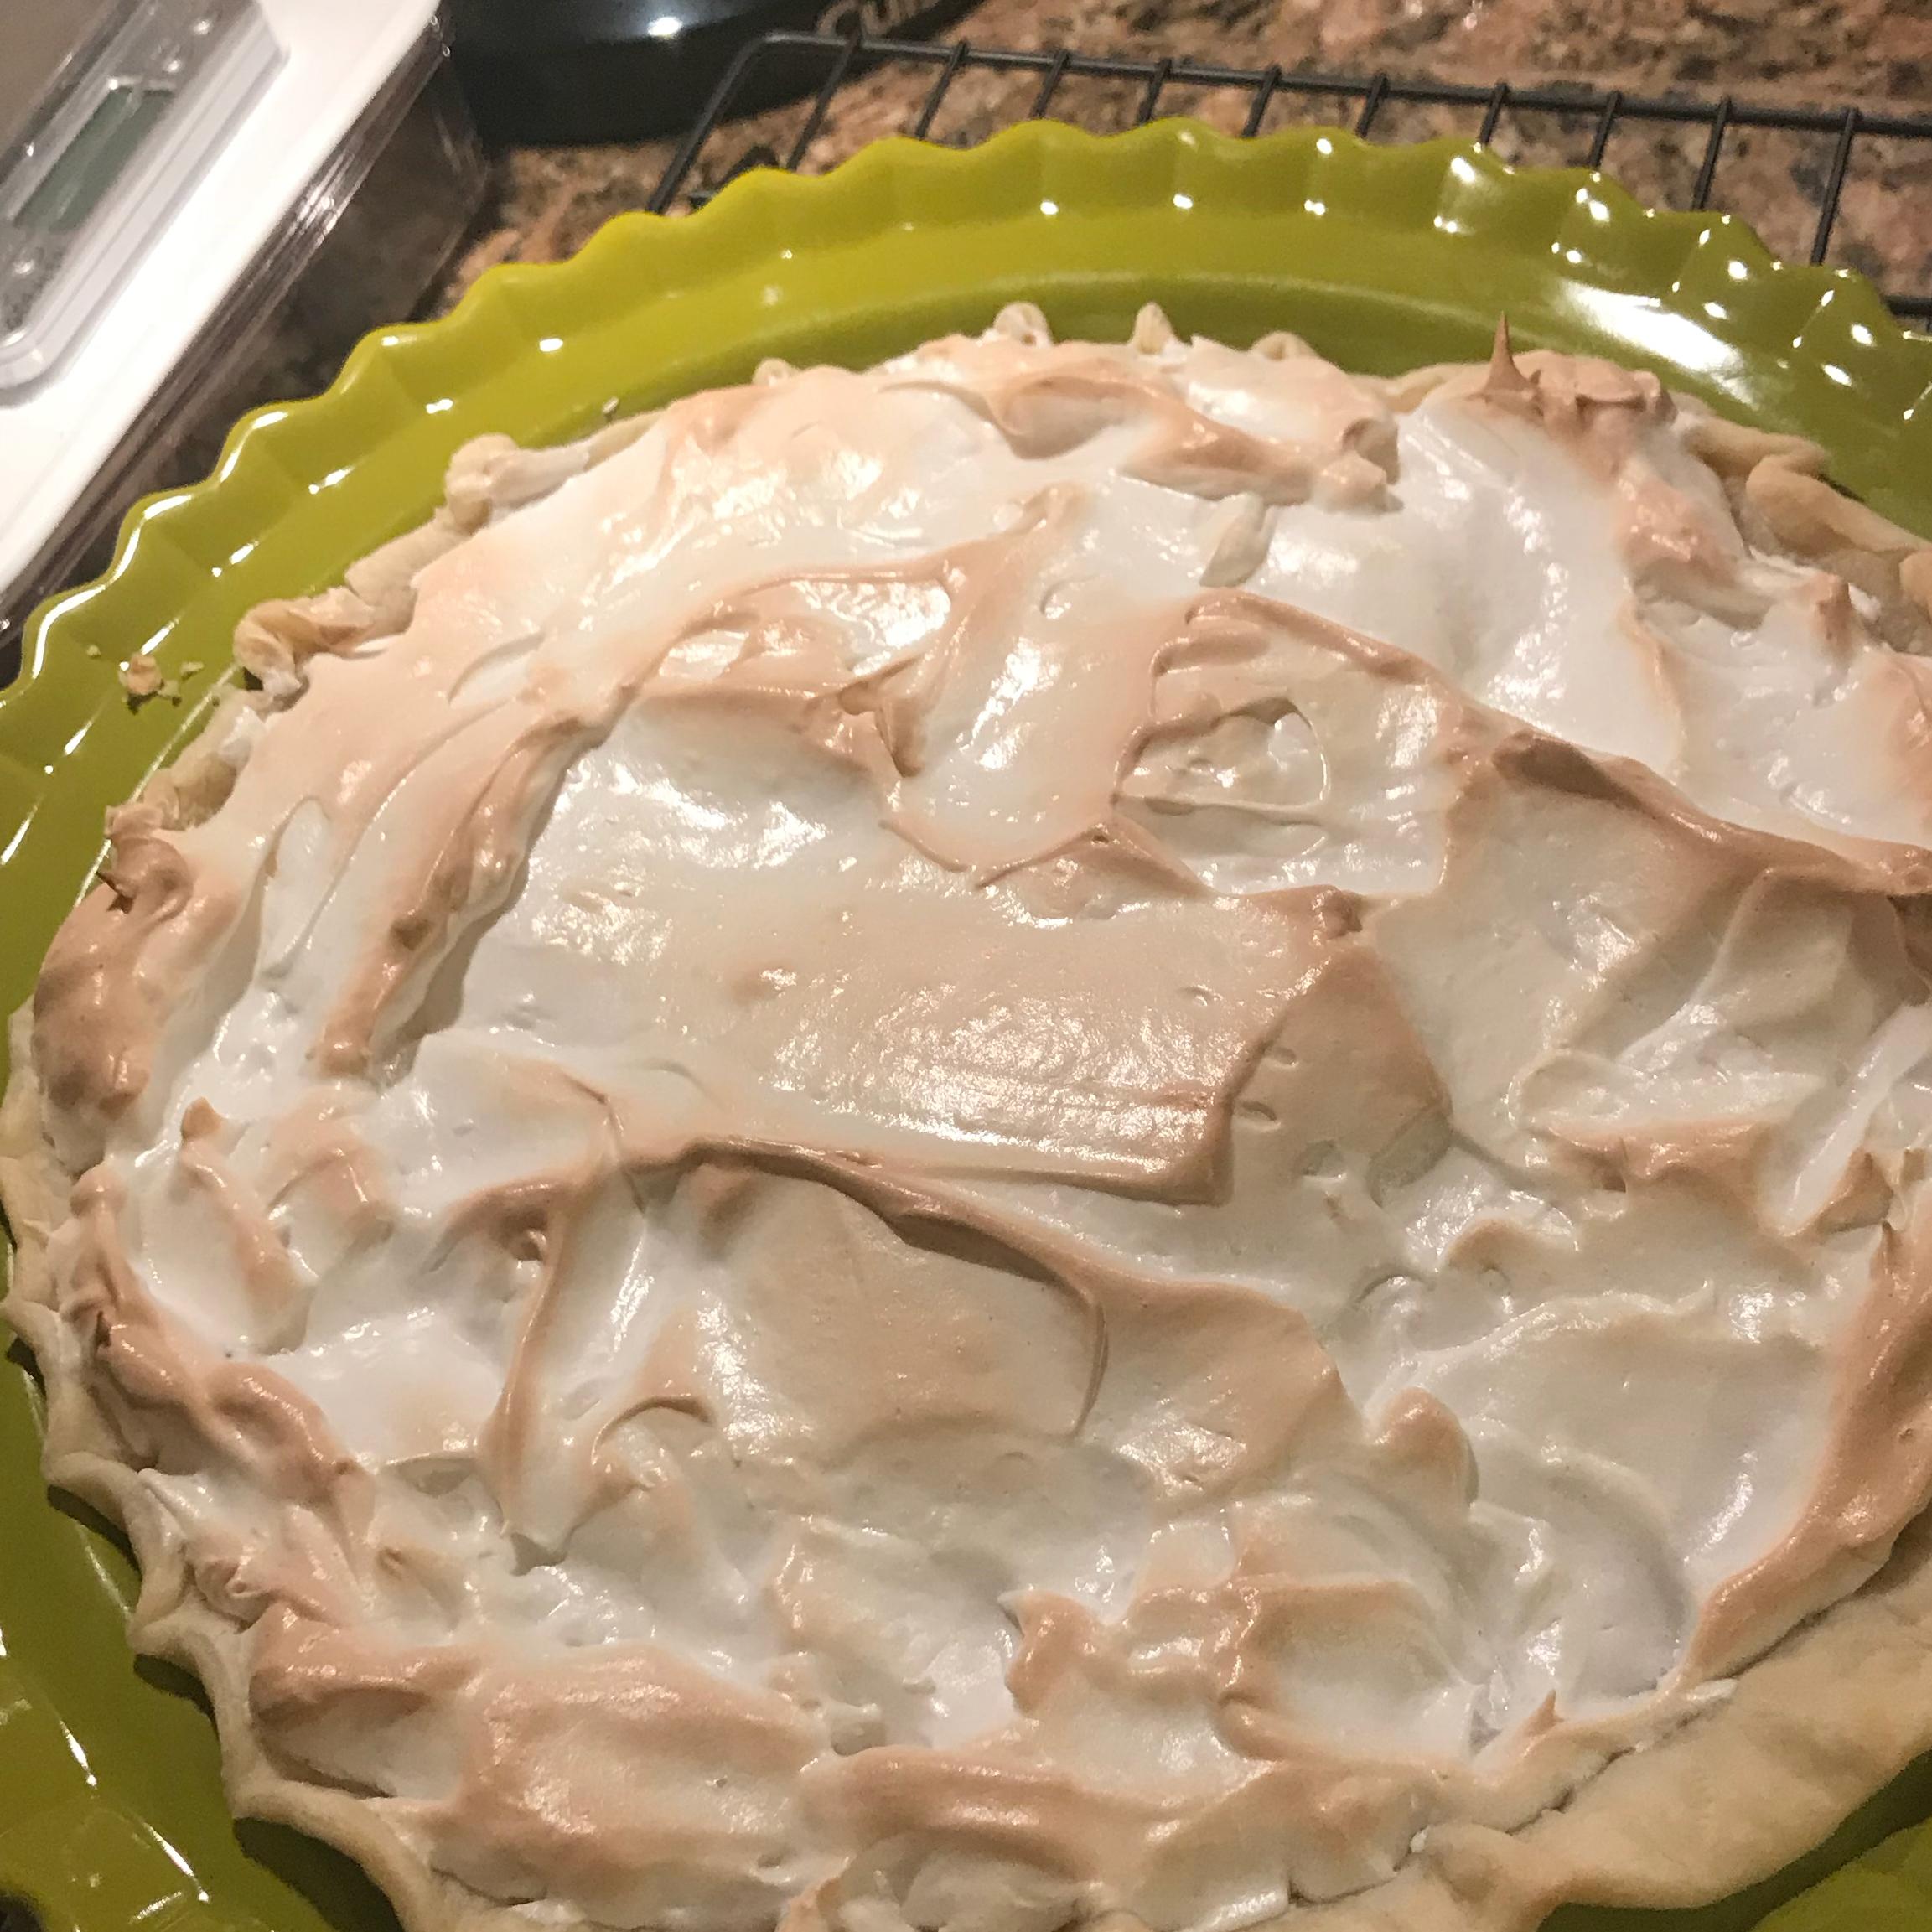 Orange Meringue Pie without Condensed Milk